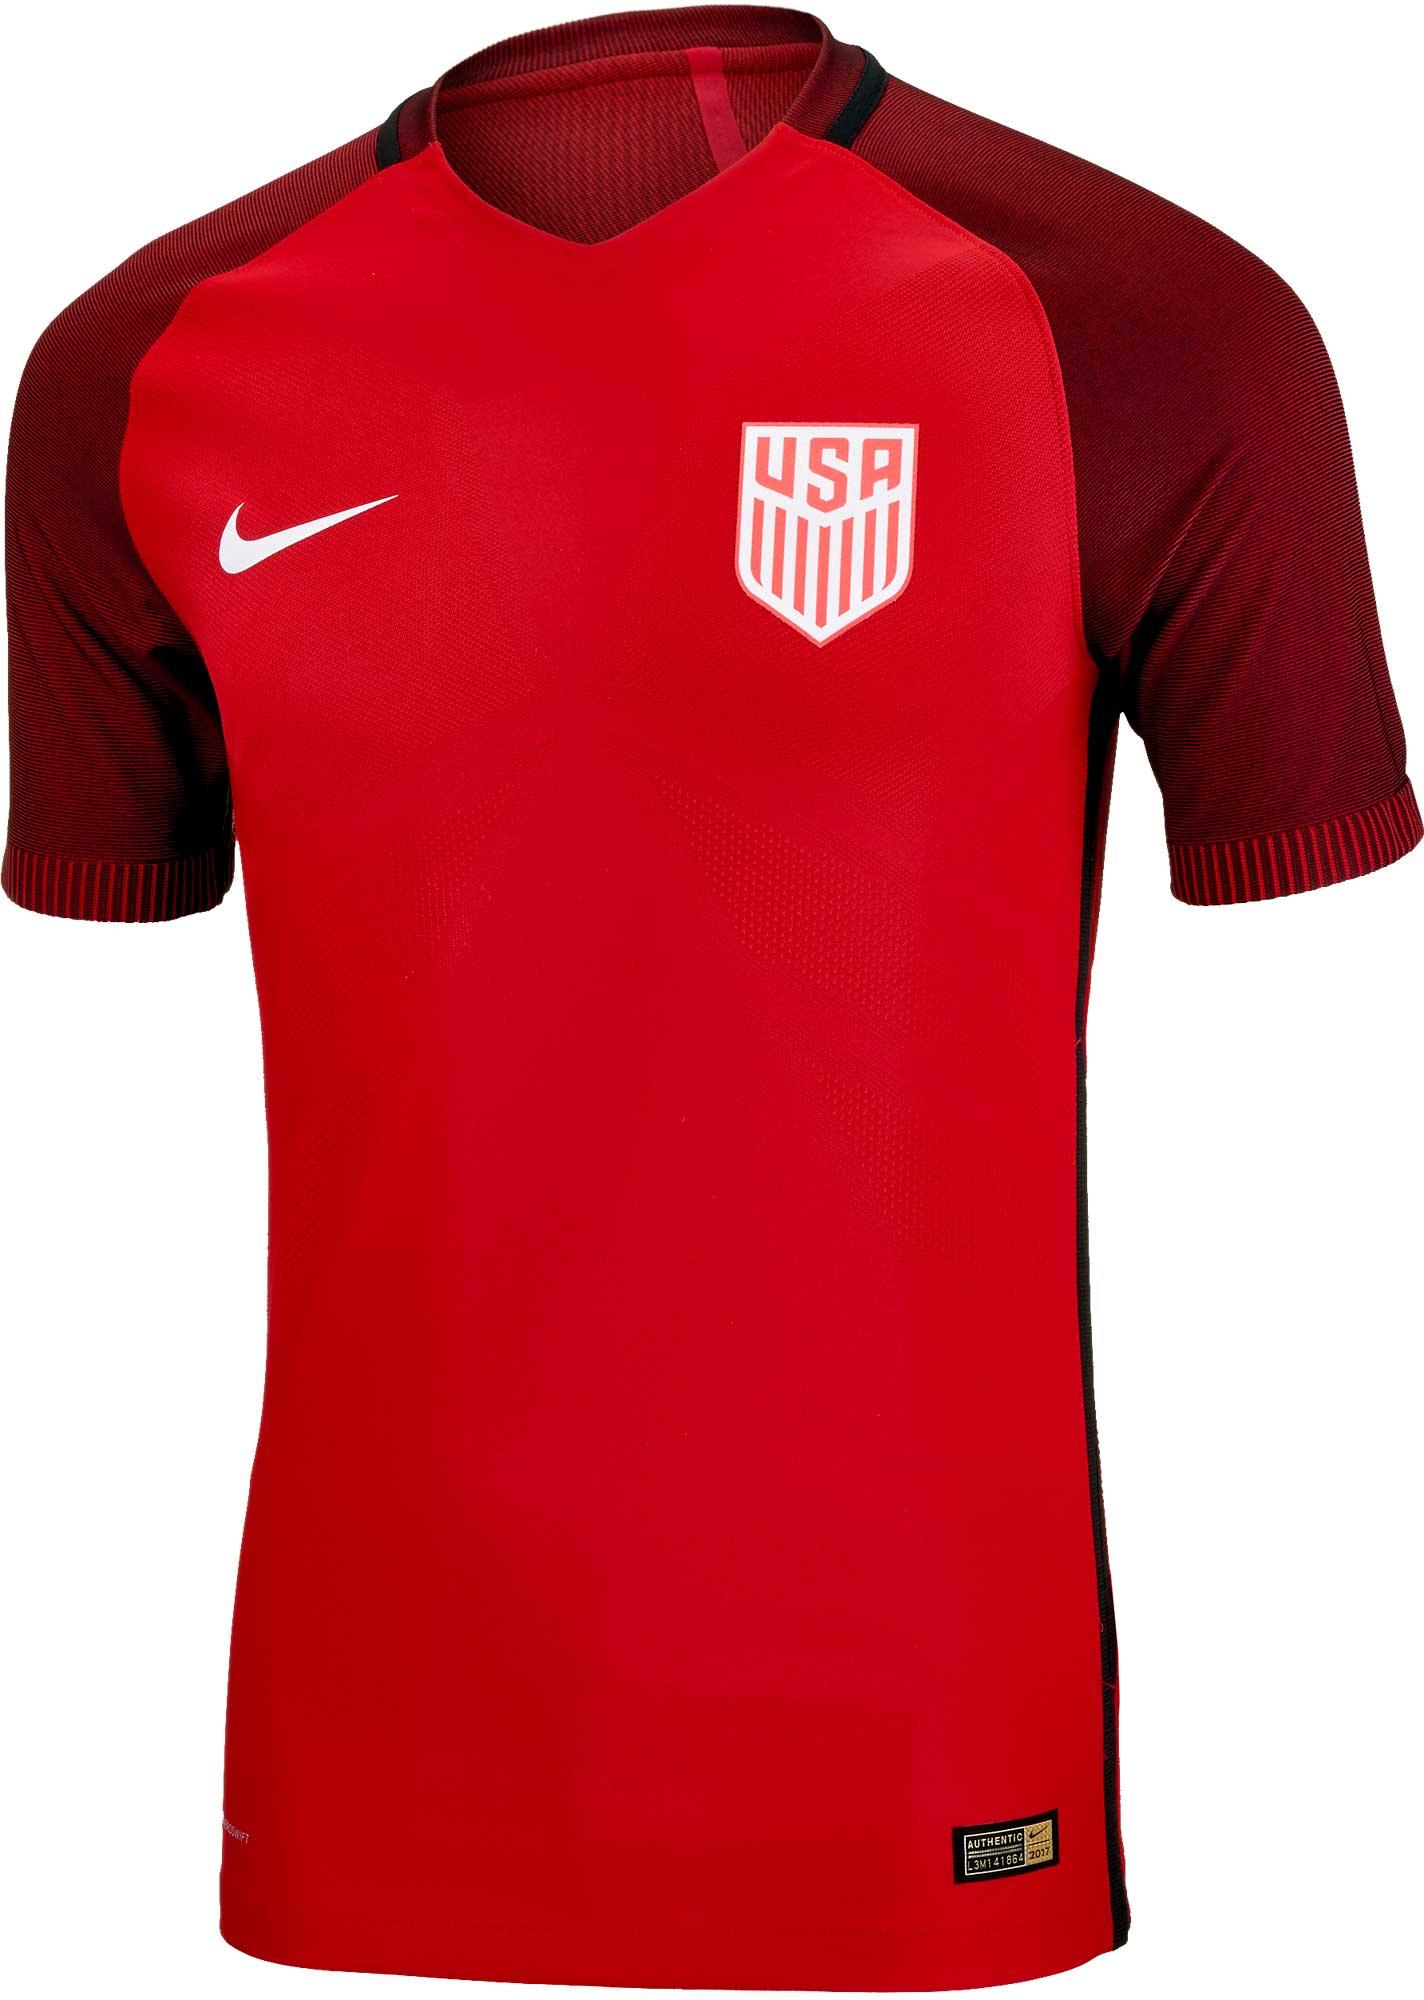 2e9ae2c7c Nike USA Vapor Match 3rd Jersey 2016-17 - Soccer Master